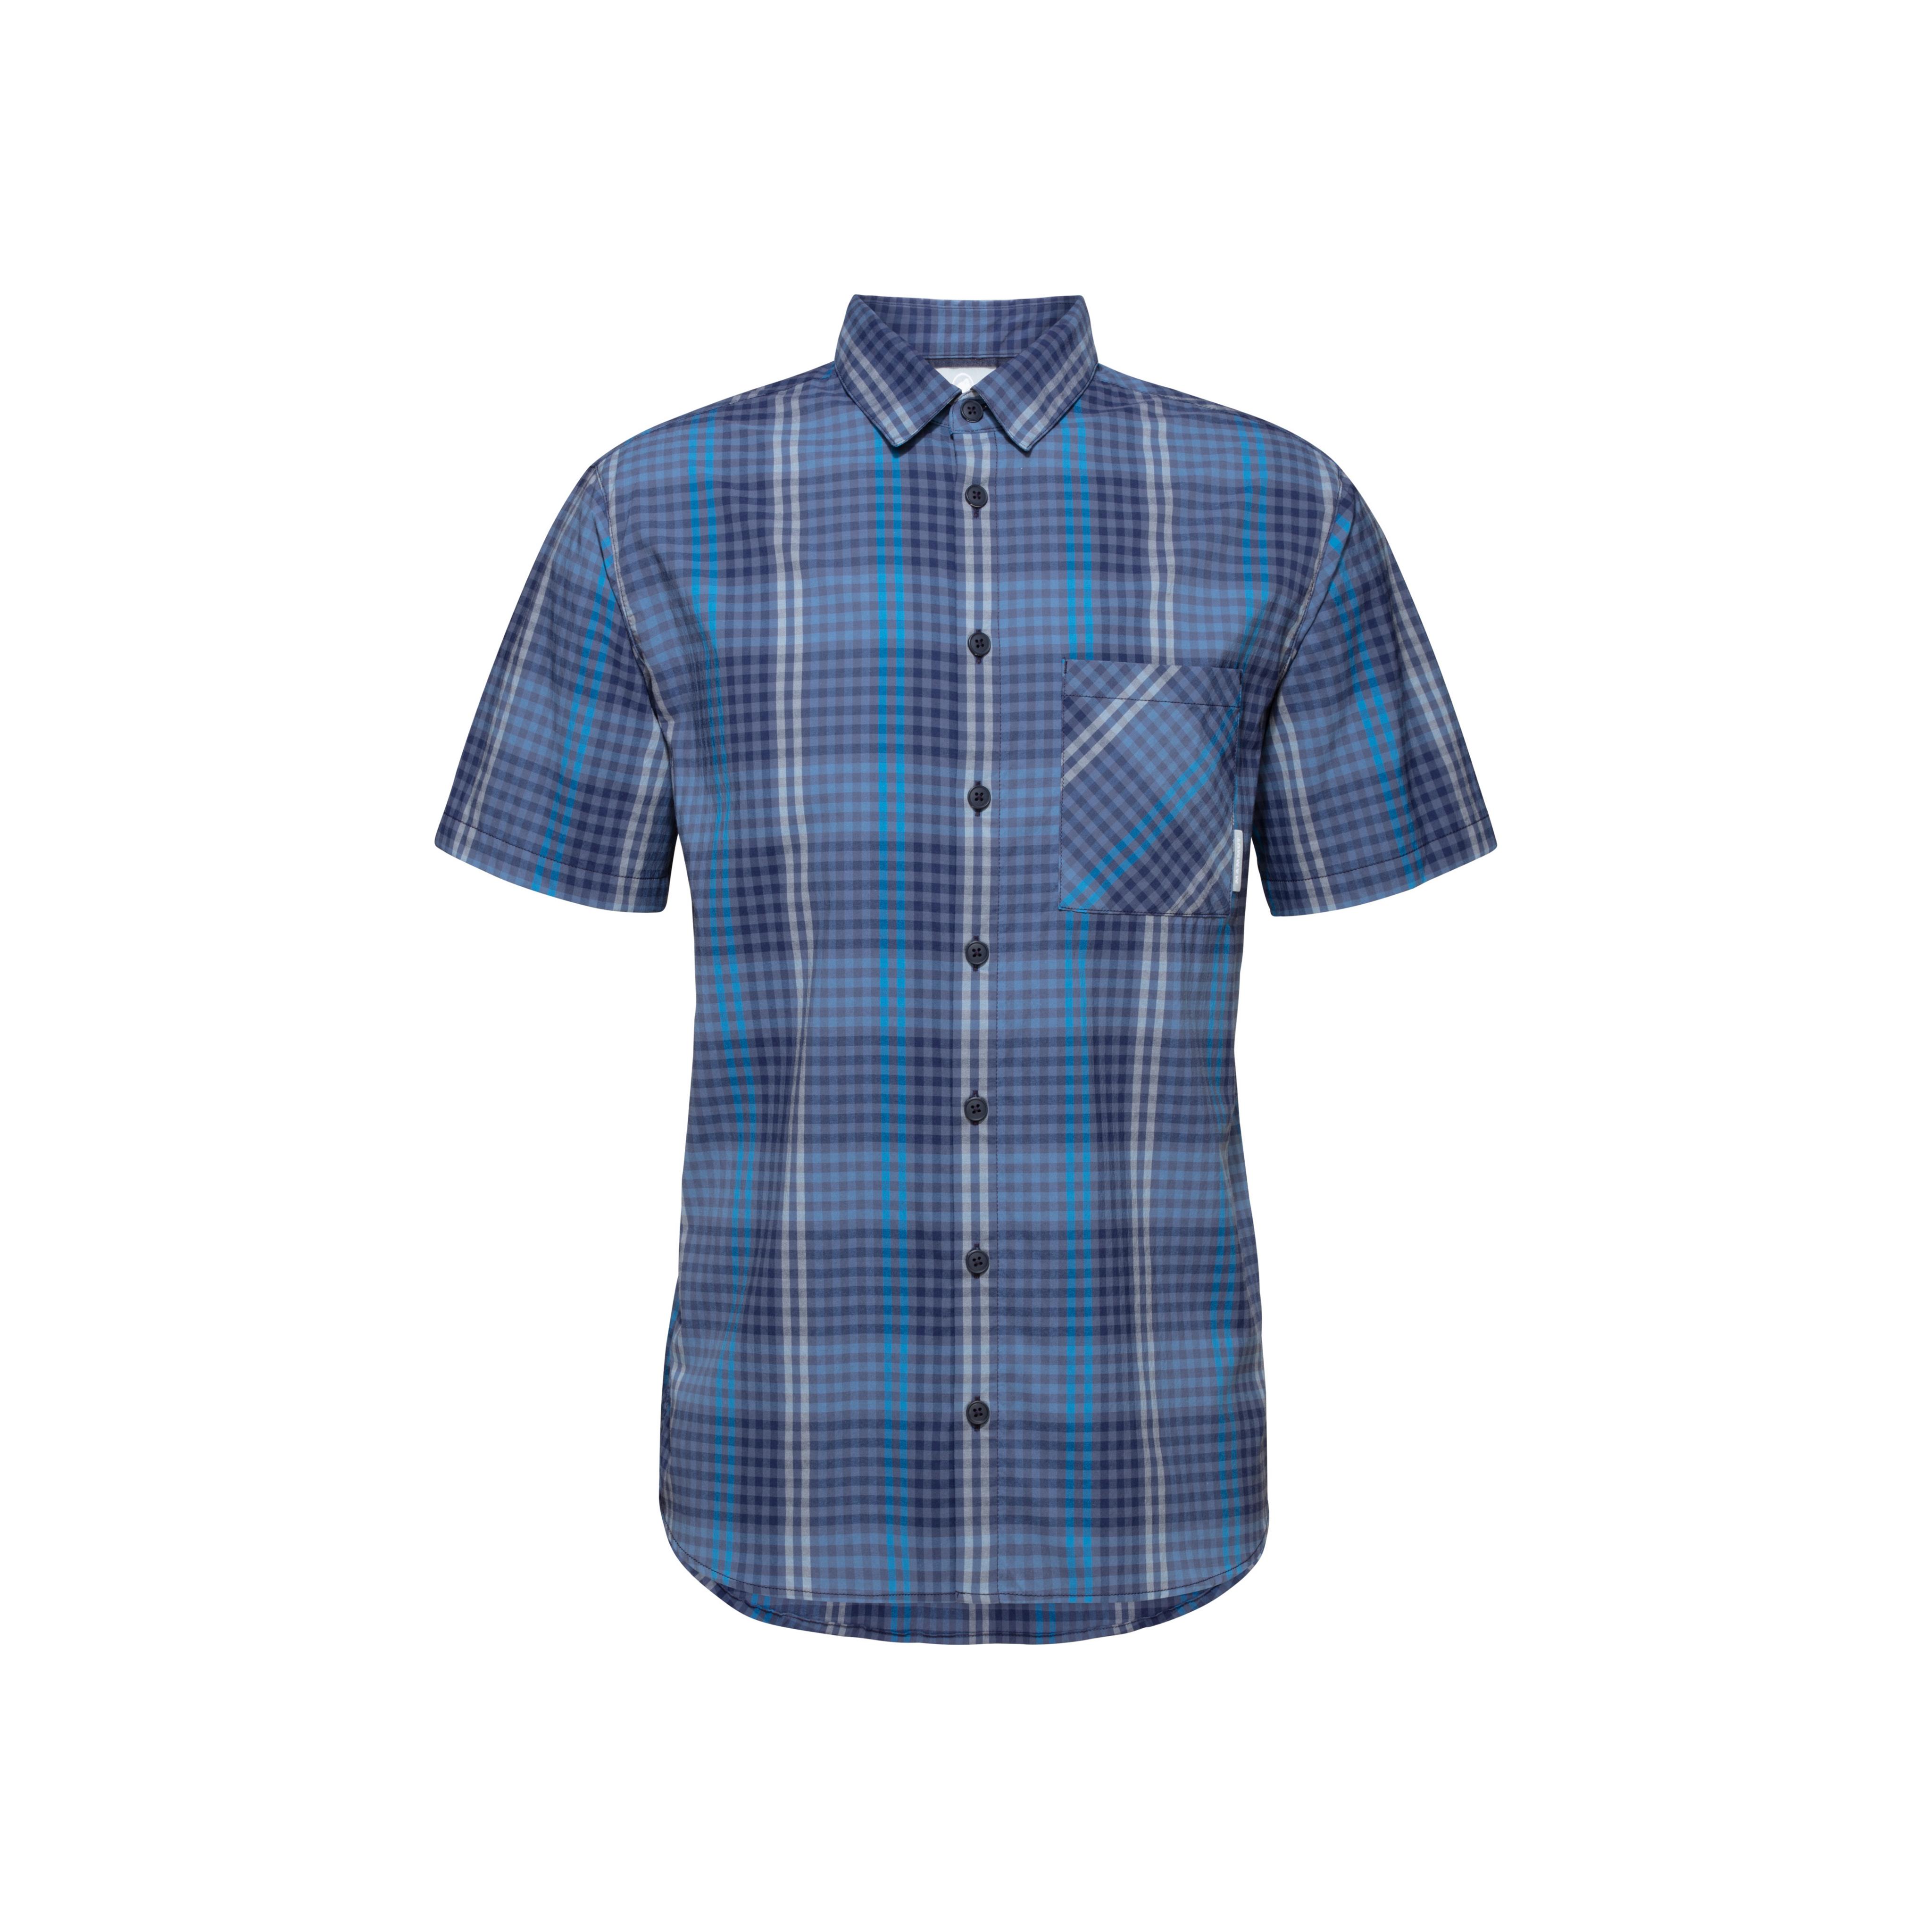 Calanca Shirt Men - peacoat-horizon, S thumbnail